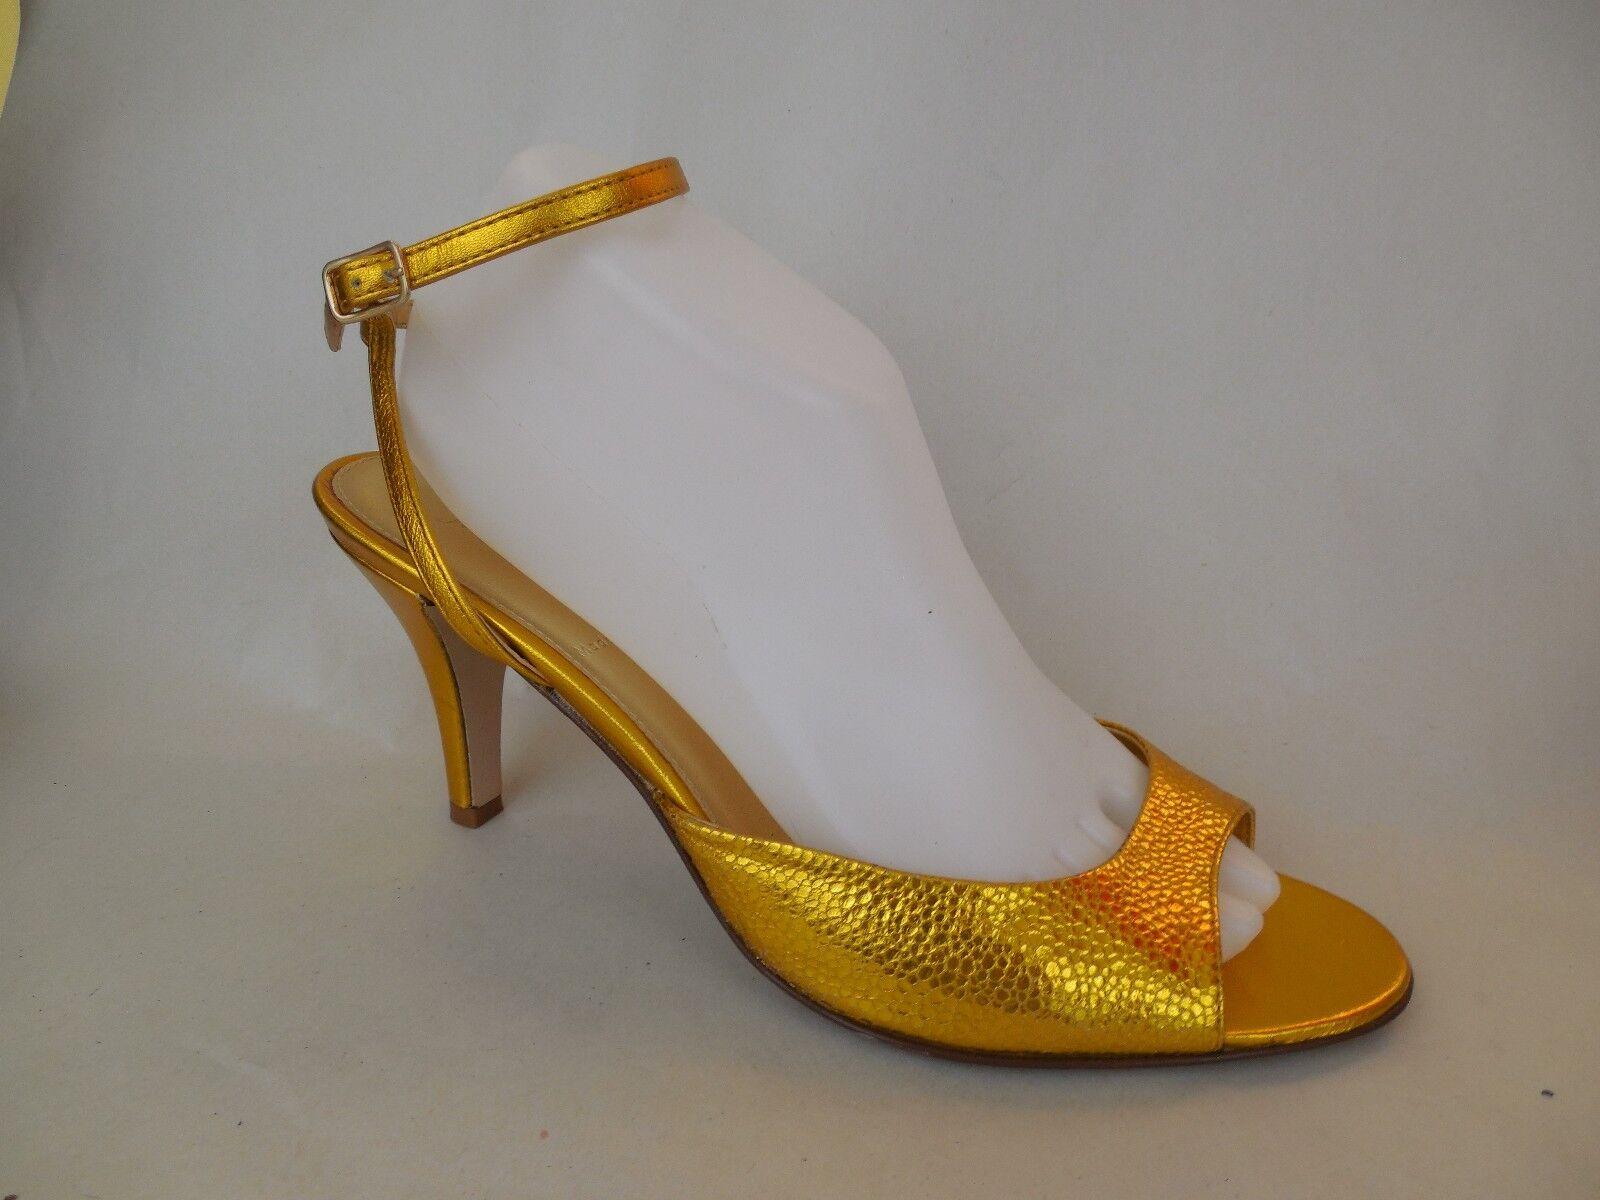 J CREW Heel Gold Leather Ankle Strap Heel CREW Pump Stiletto Size 9 M Italy Sexy Open Toe 17353b